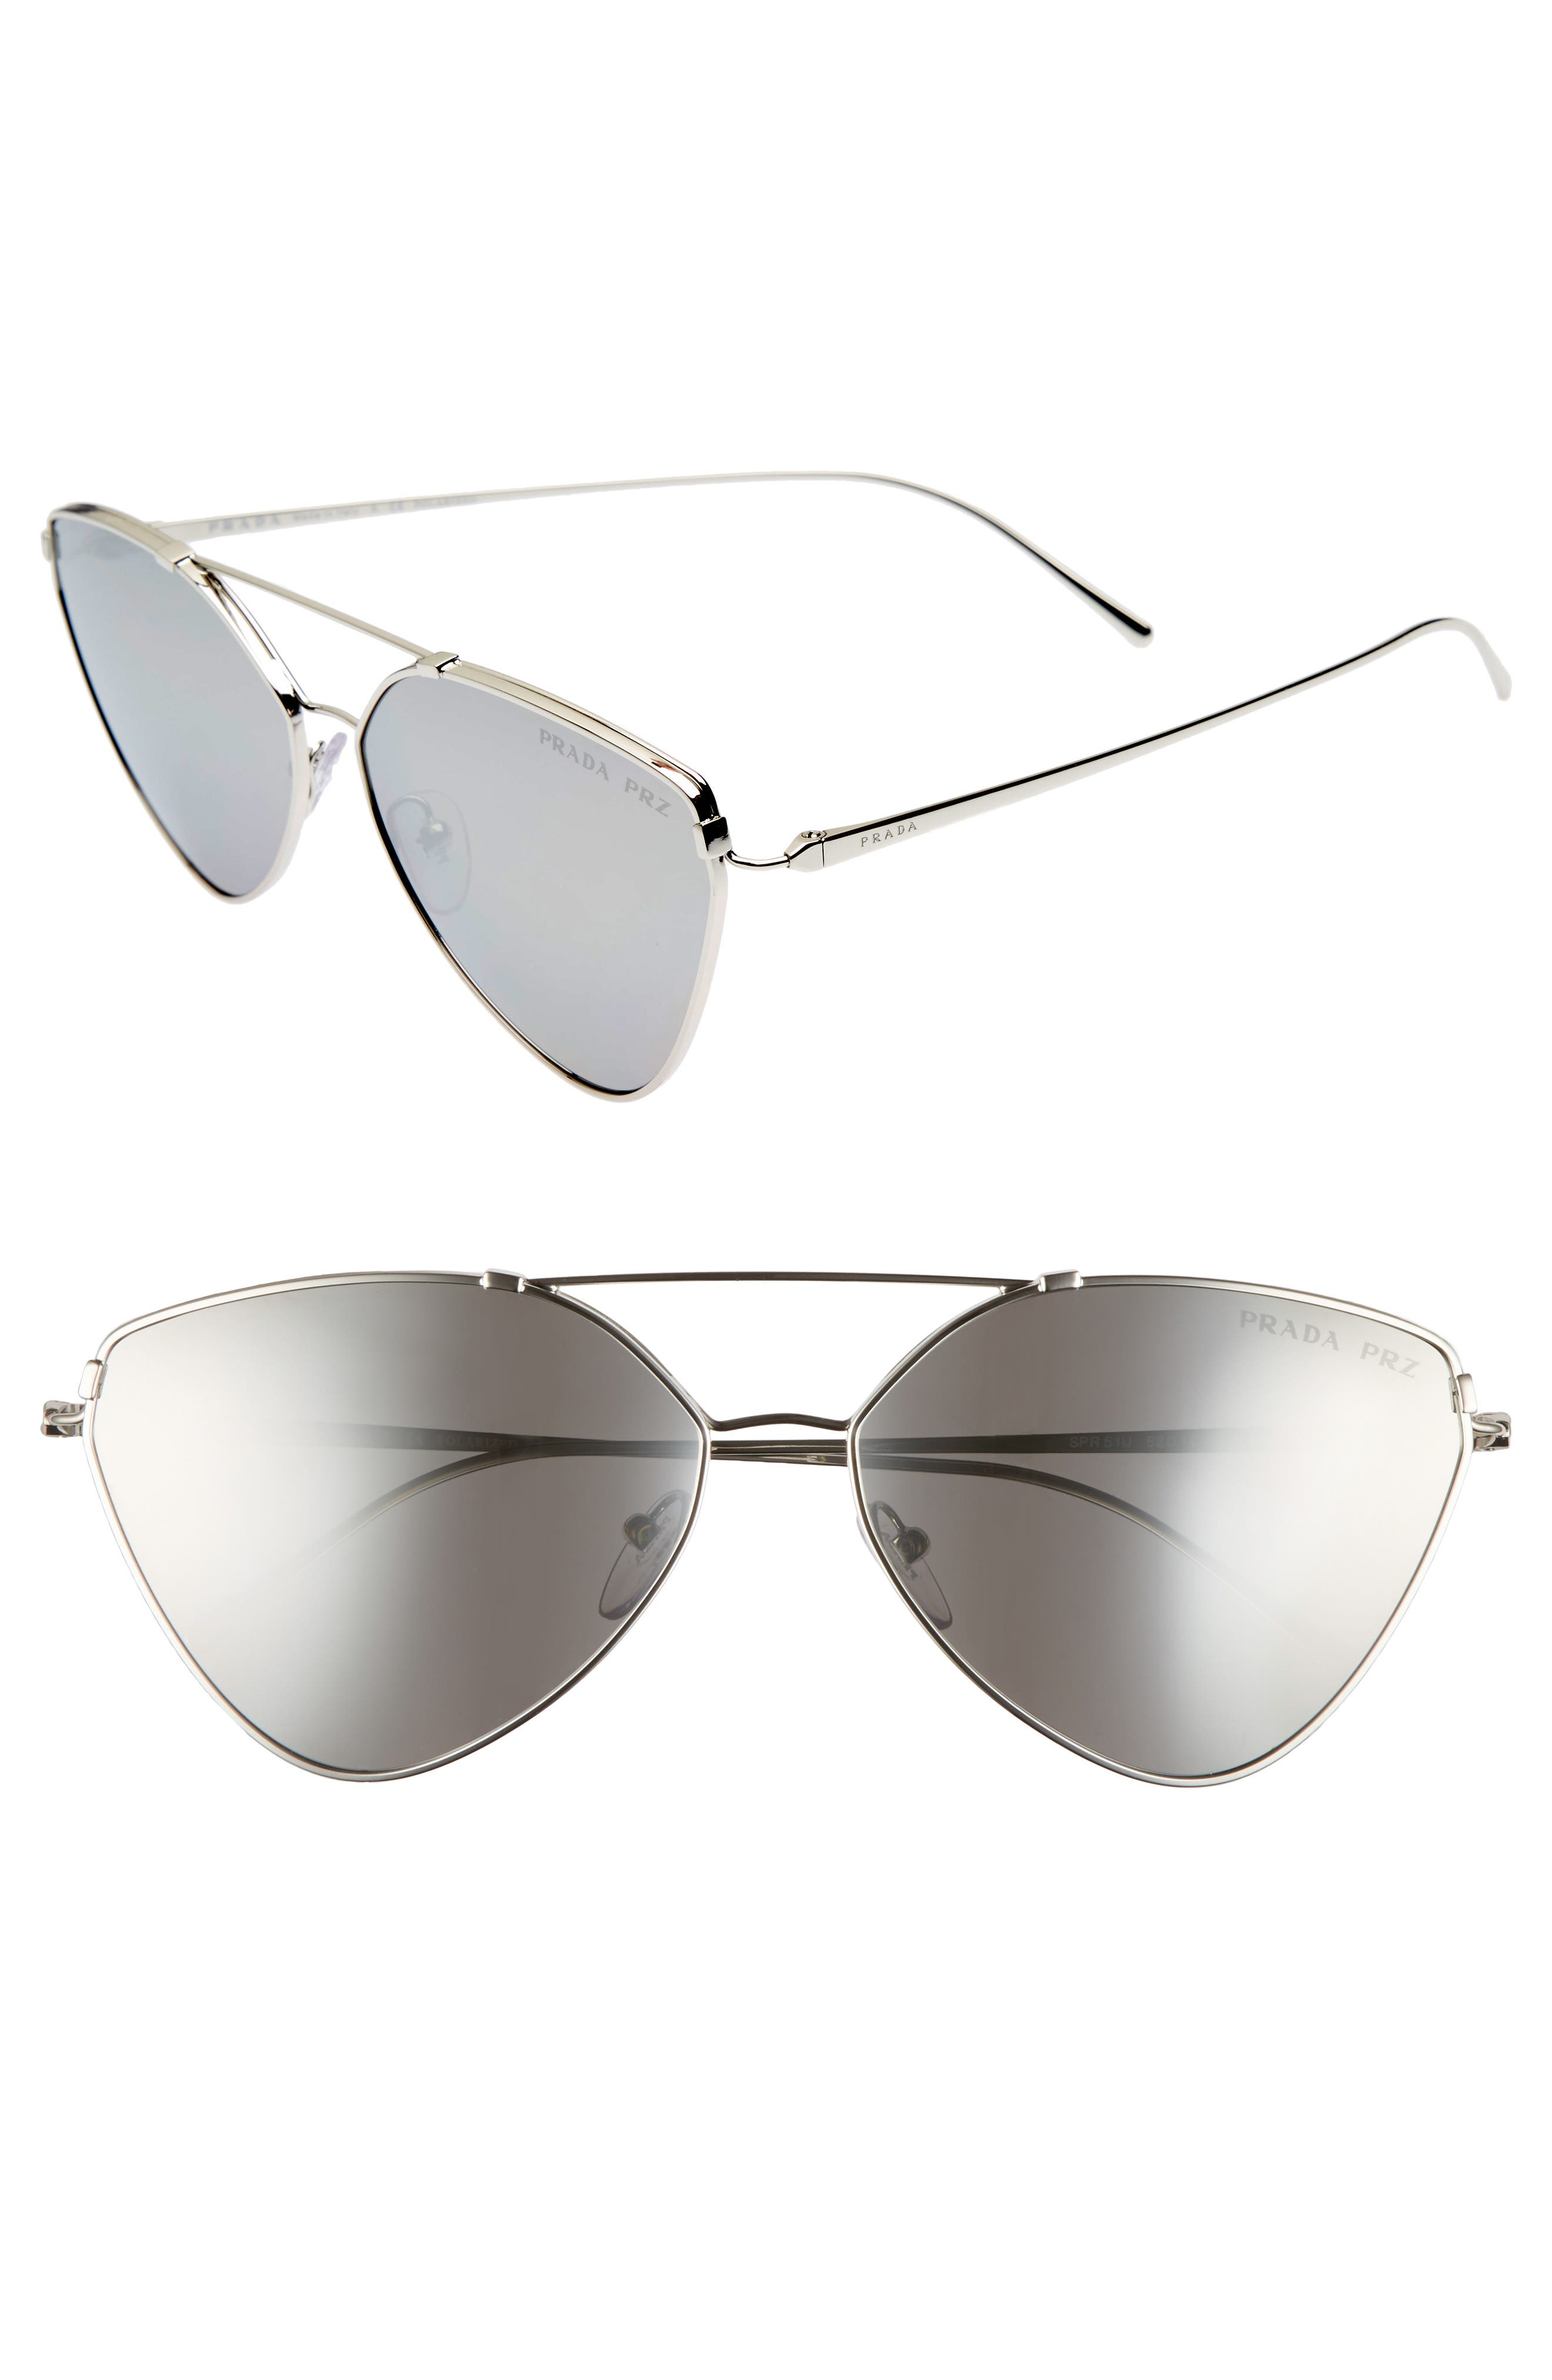 62mm Polarized Oversize Aviator Sunglasses,                         Main,                         color, 042